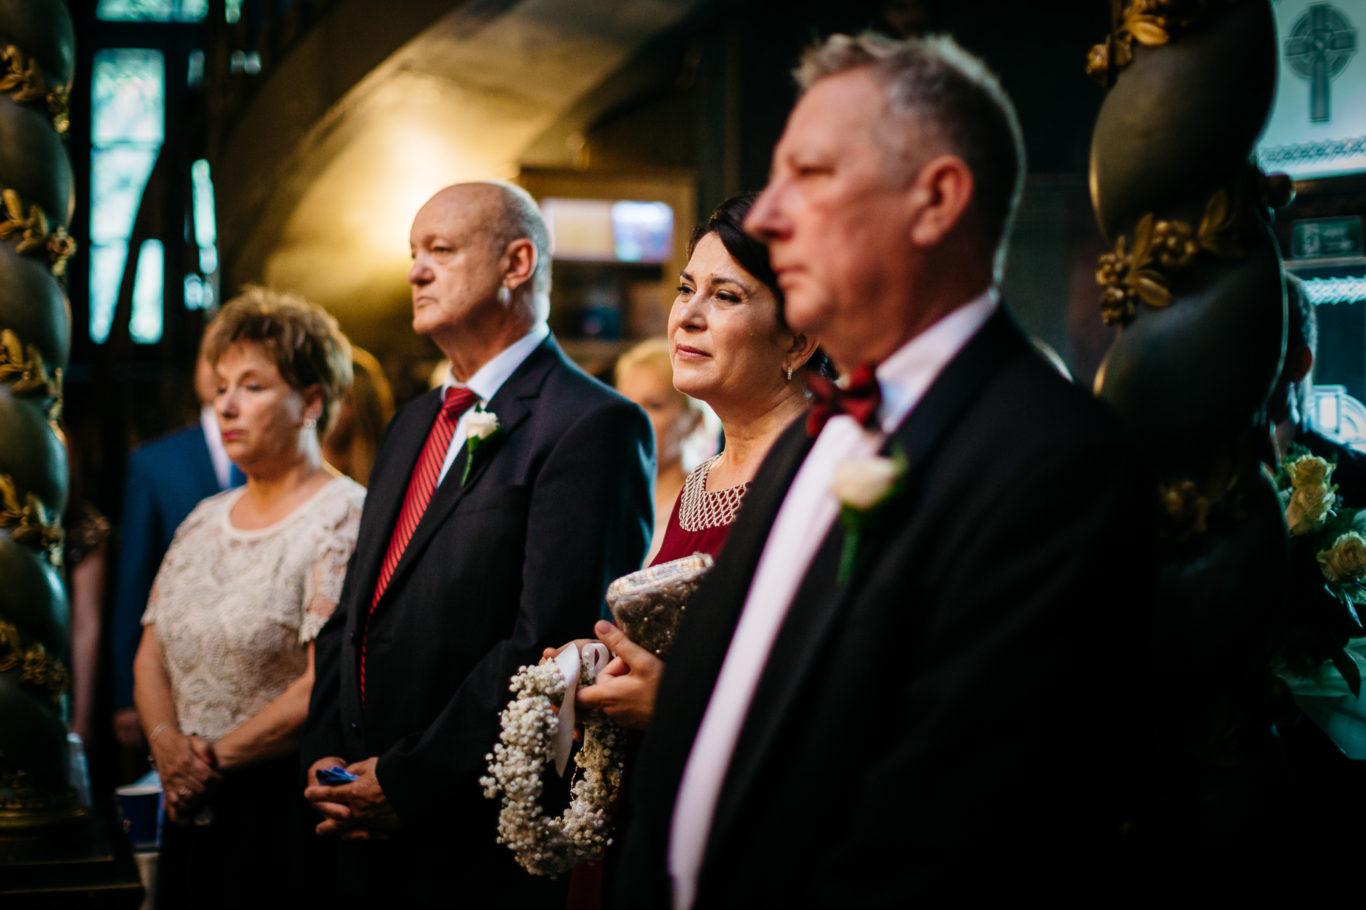 0375-Fotografie-nunta-Bucuresti-Oana-Catalin-fotograf-Ciprian-Dumitrescu-CDF_0563